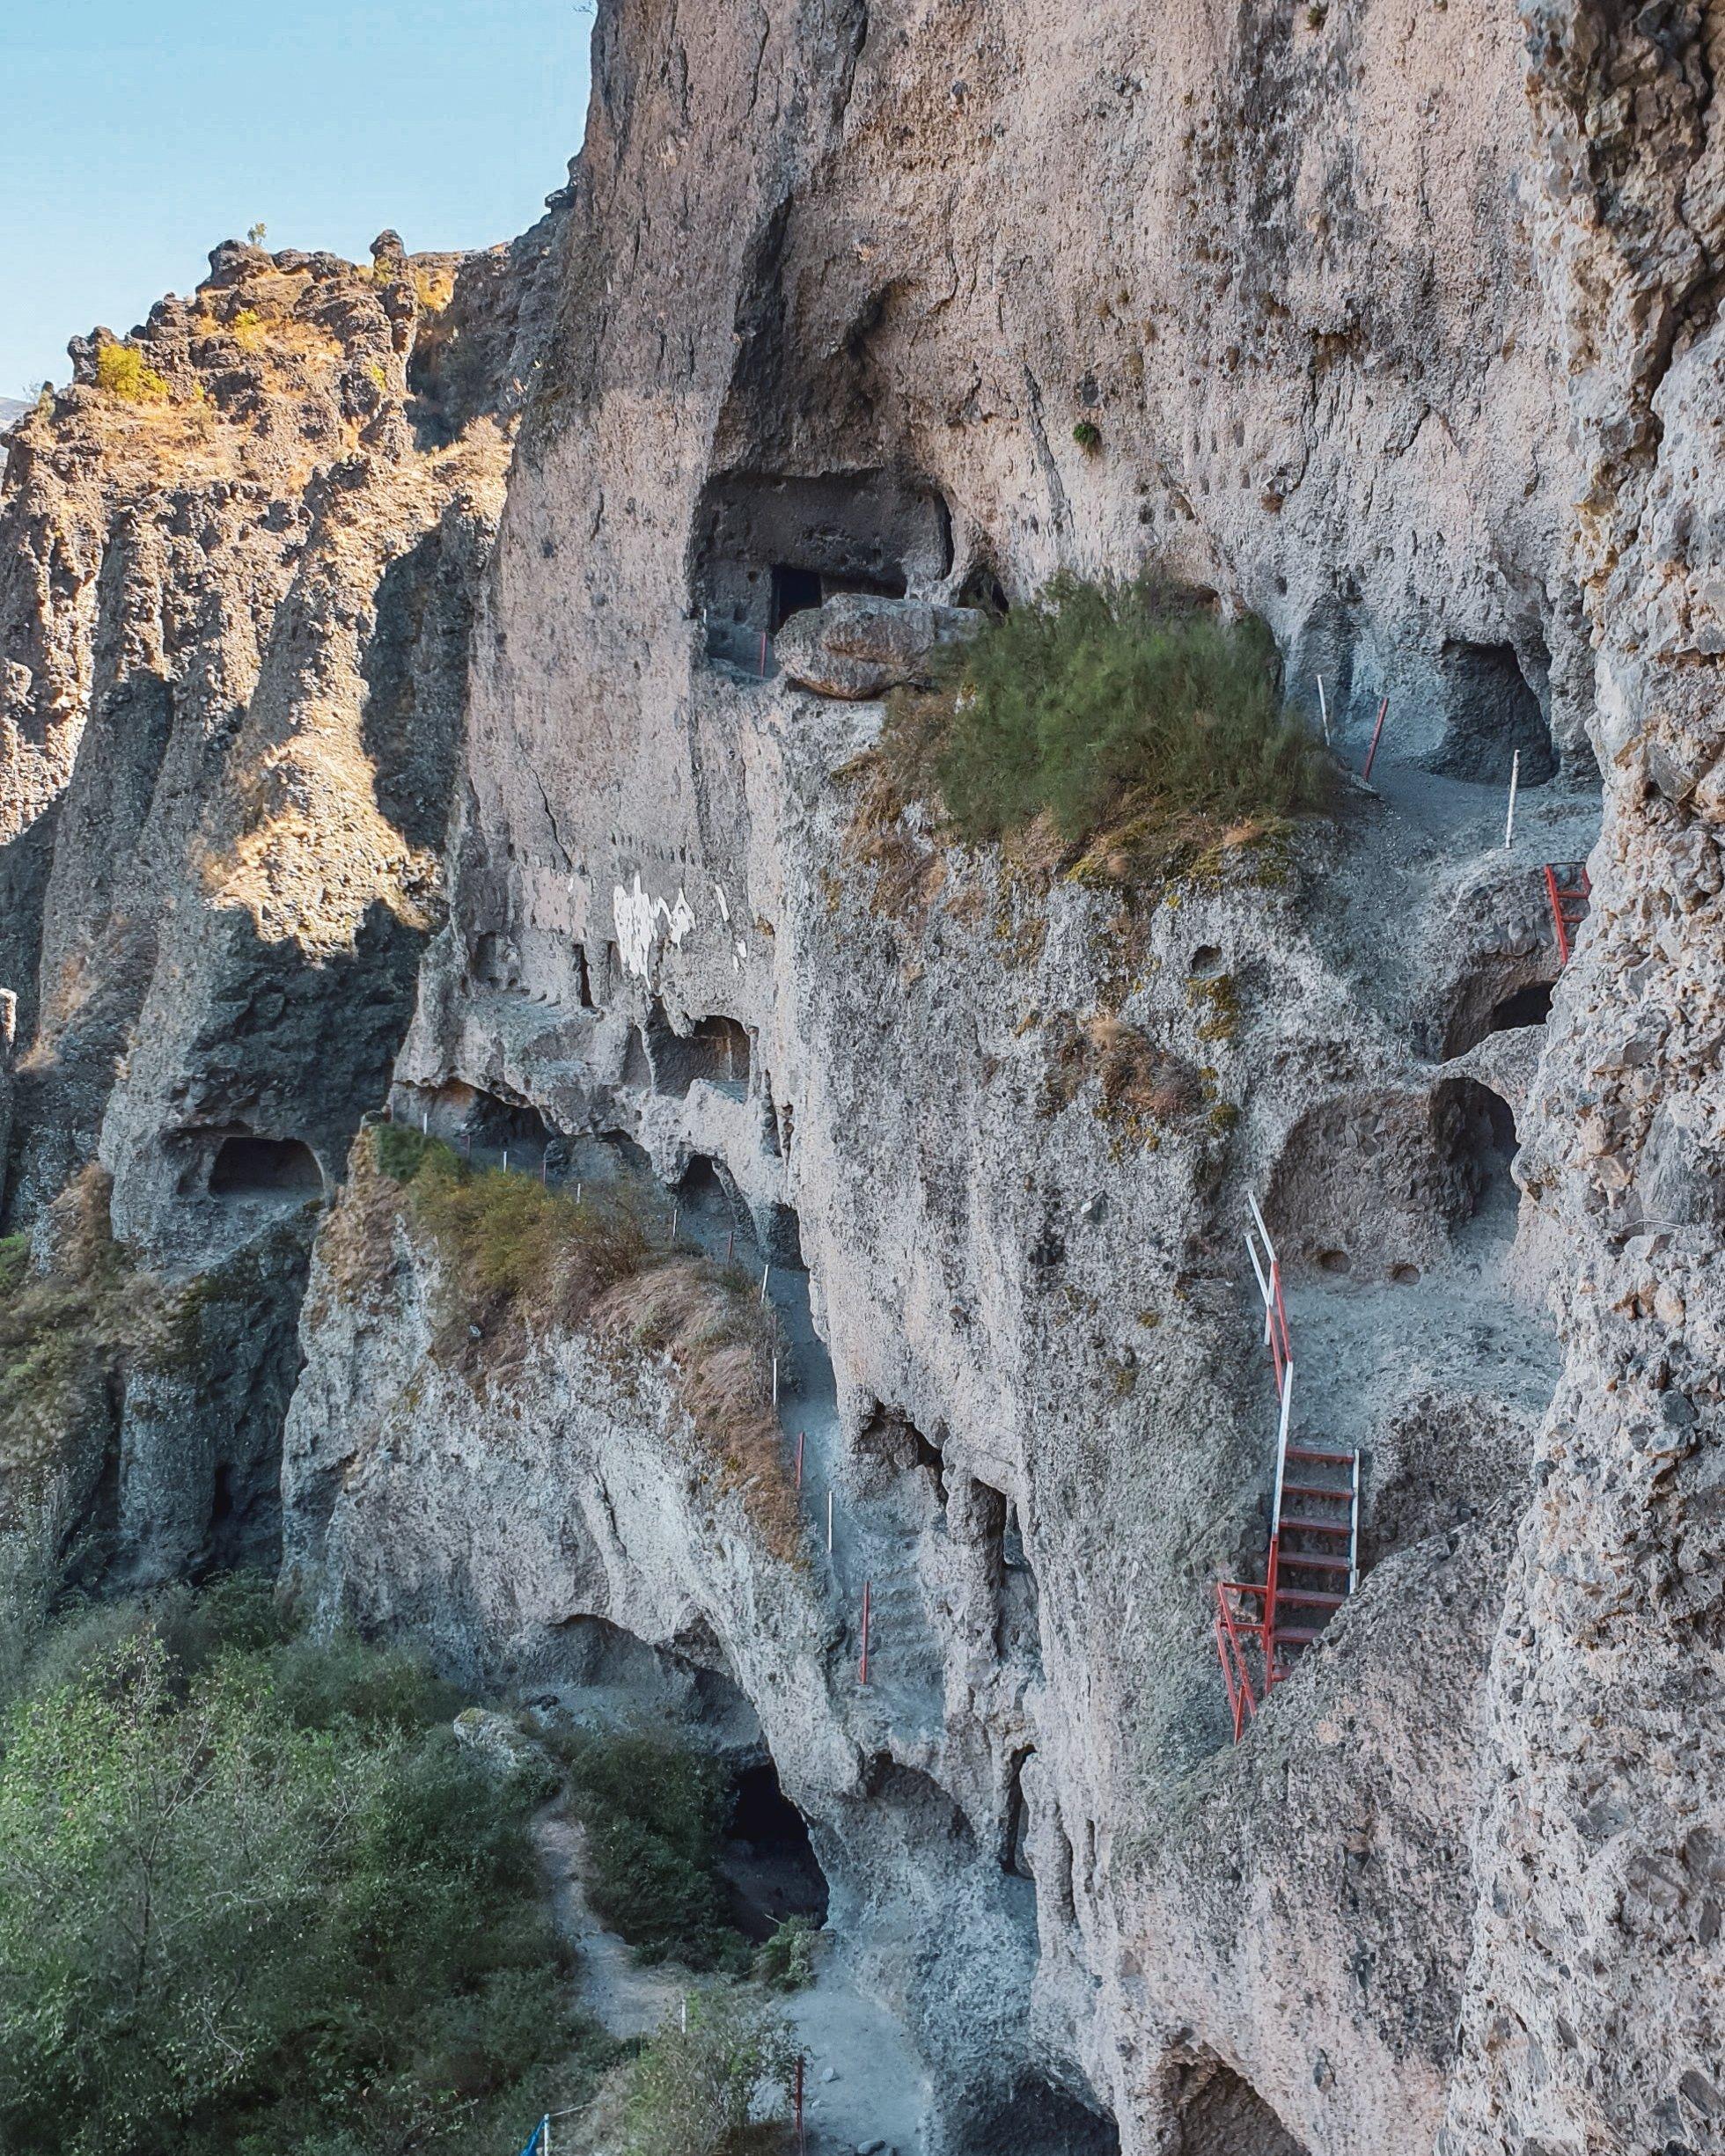 Inönü洞穴的外部崎and而神秘。 (照片来自Argun Konuk)